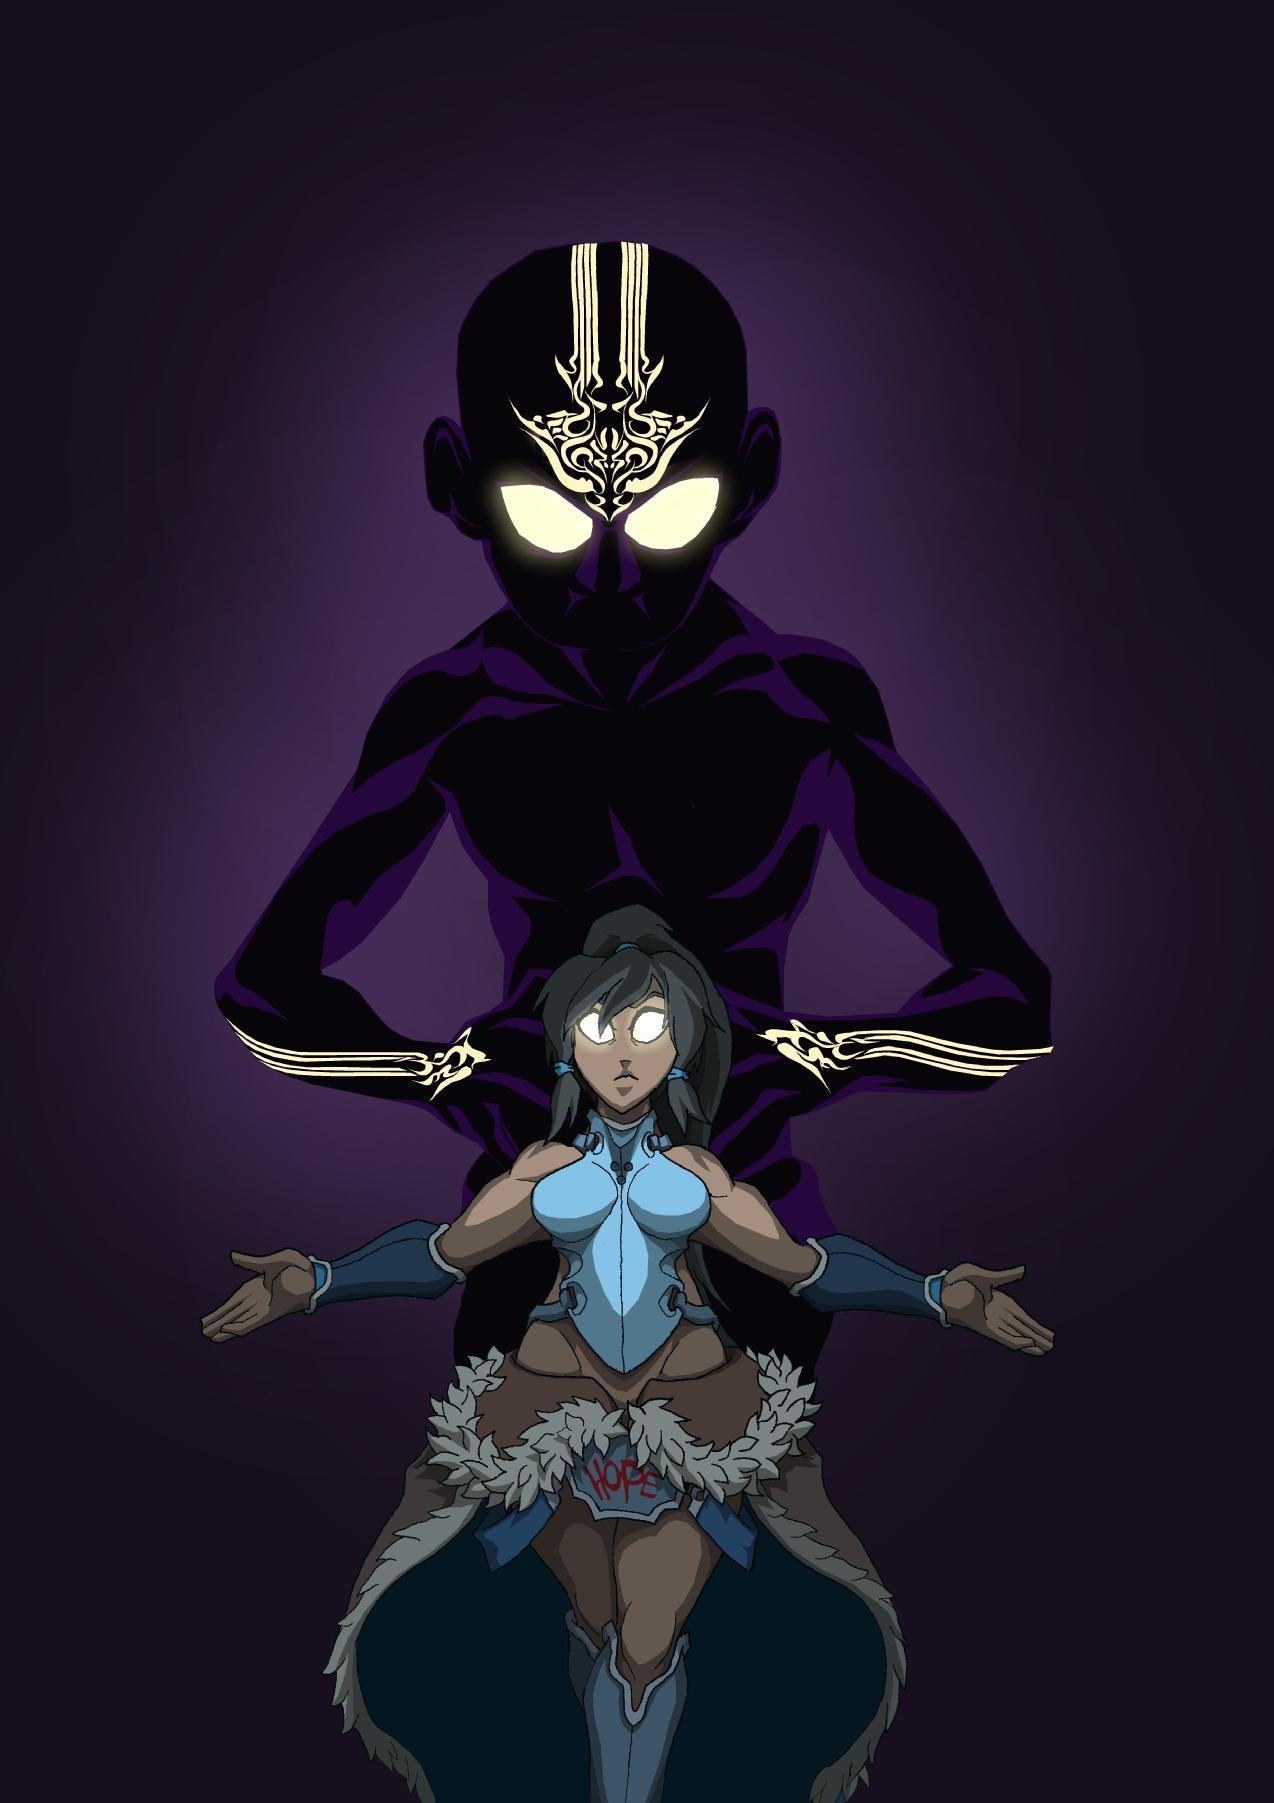 The Avatar State by Tyrranux on DeviantArt